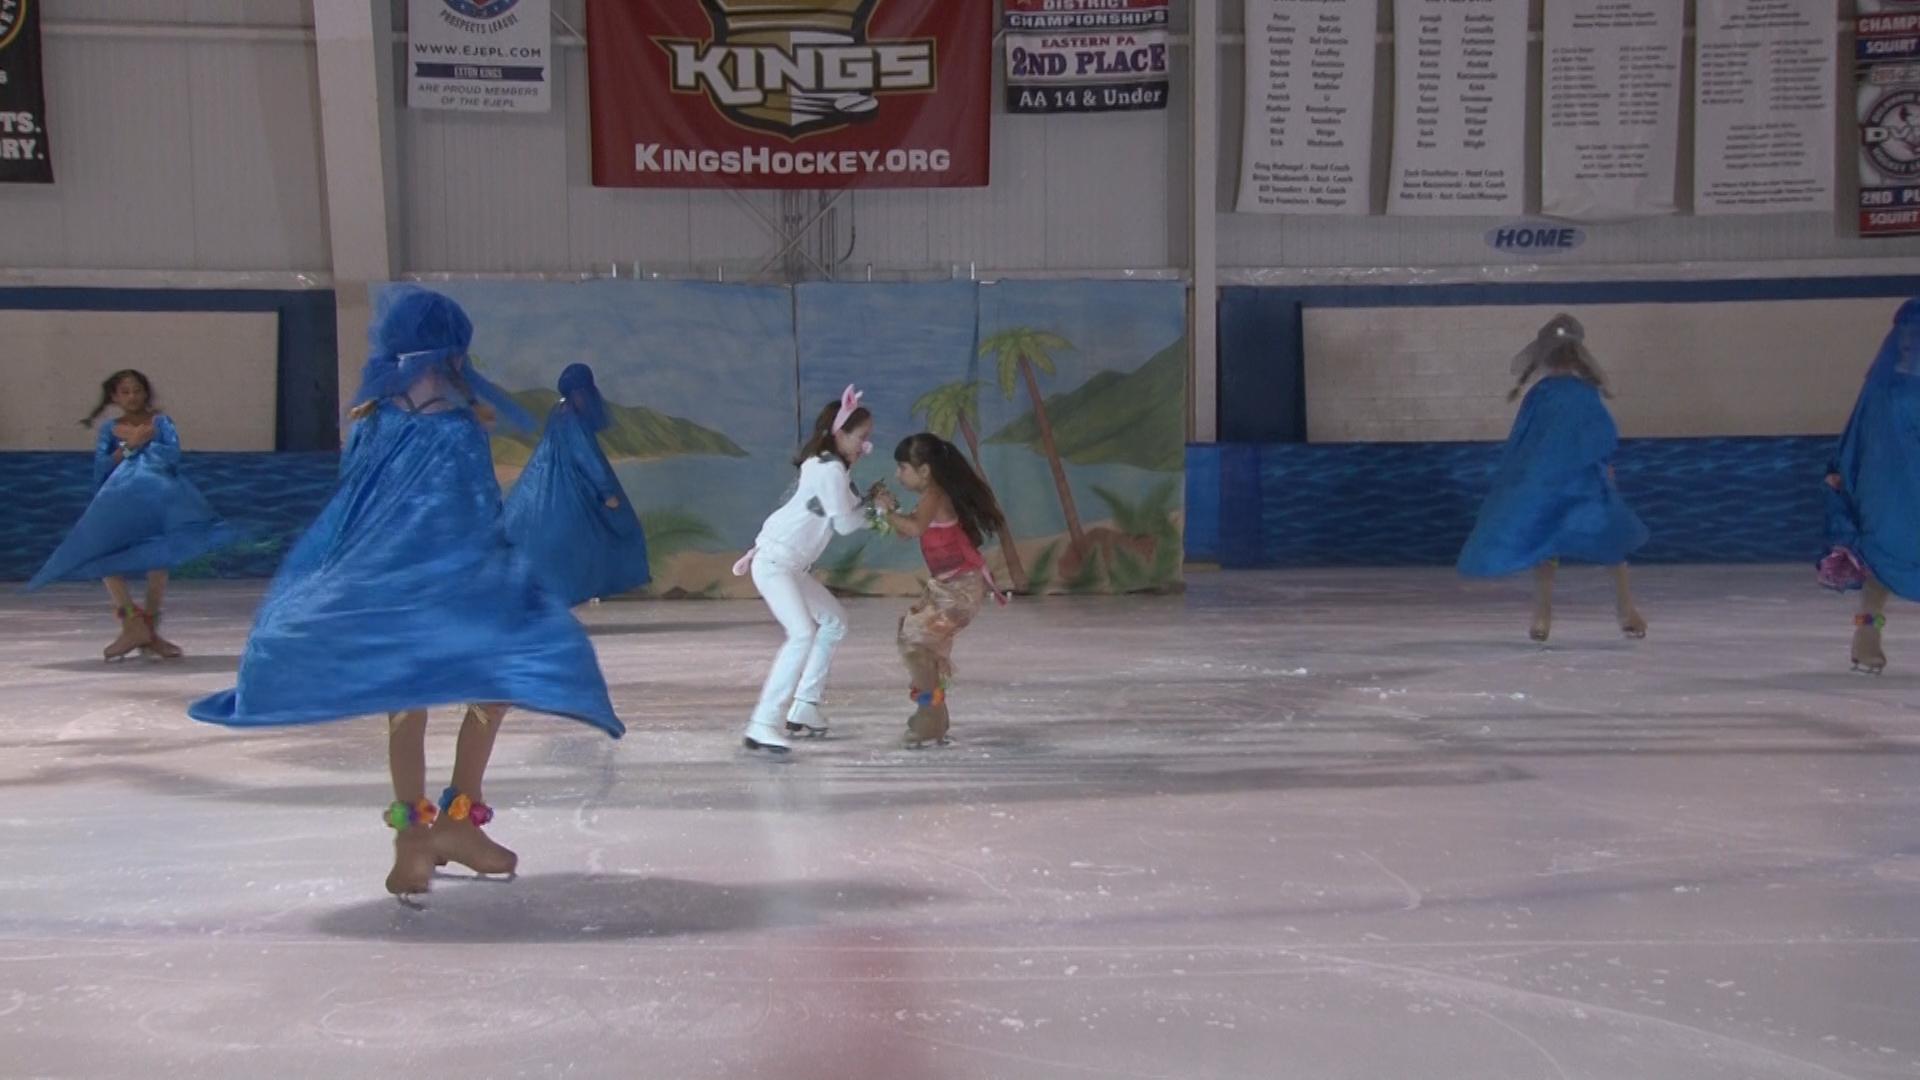 Power Play Maui Skate on Ice 071417.00_06_31_03.Still005.jpg